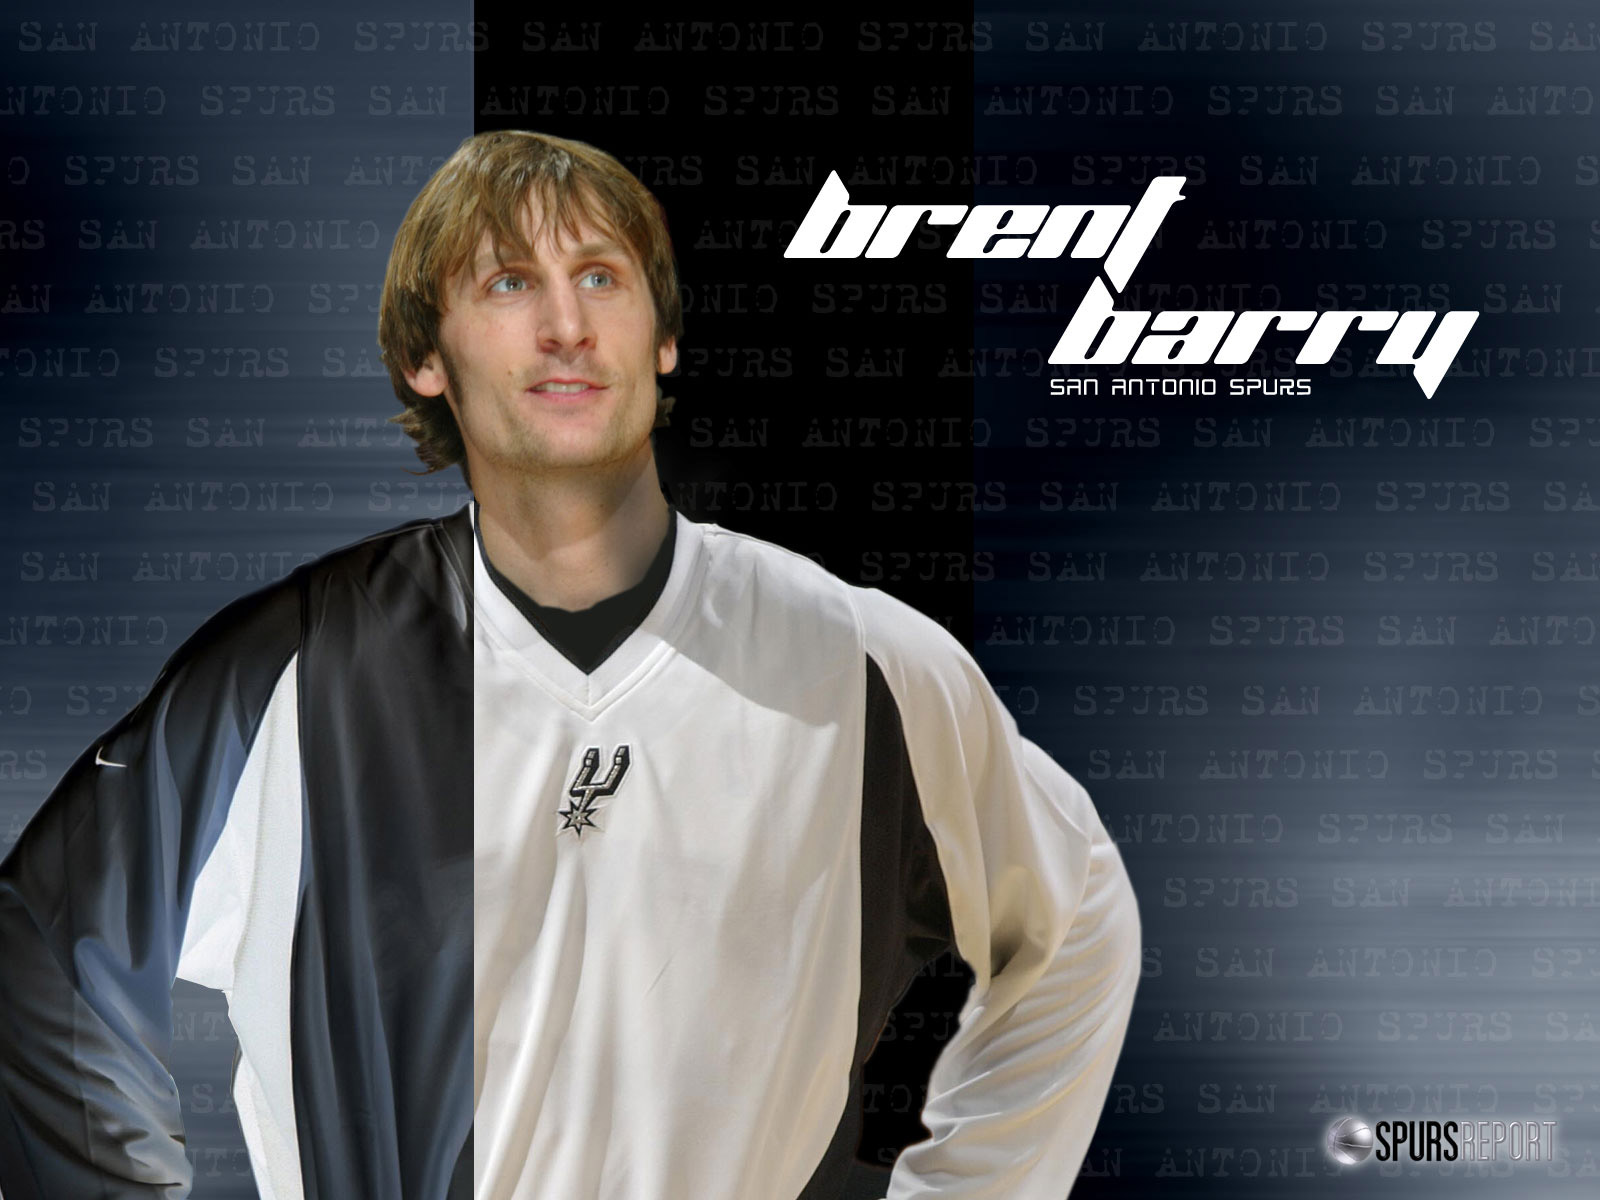 Kawhi Leonard Iphone Wallpaper Brent Barry Wallpaper Basketball Wallpapers At